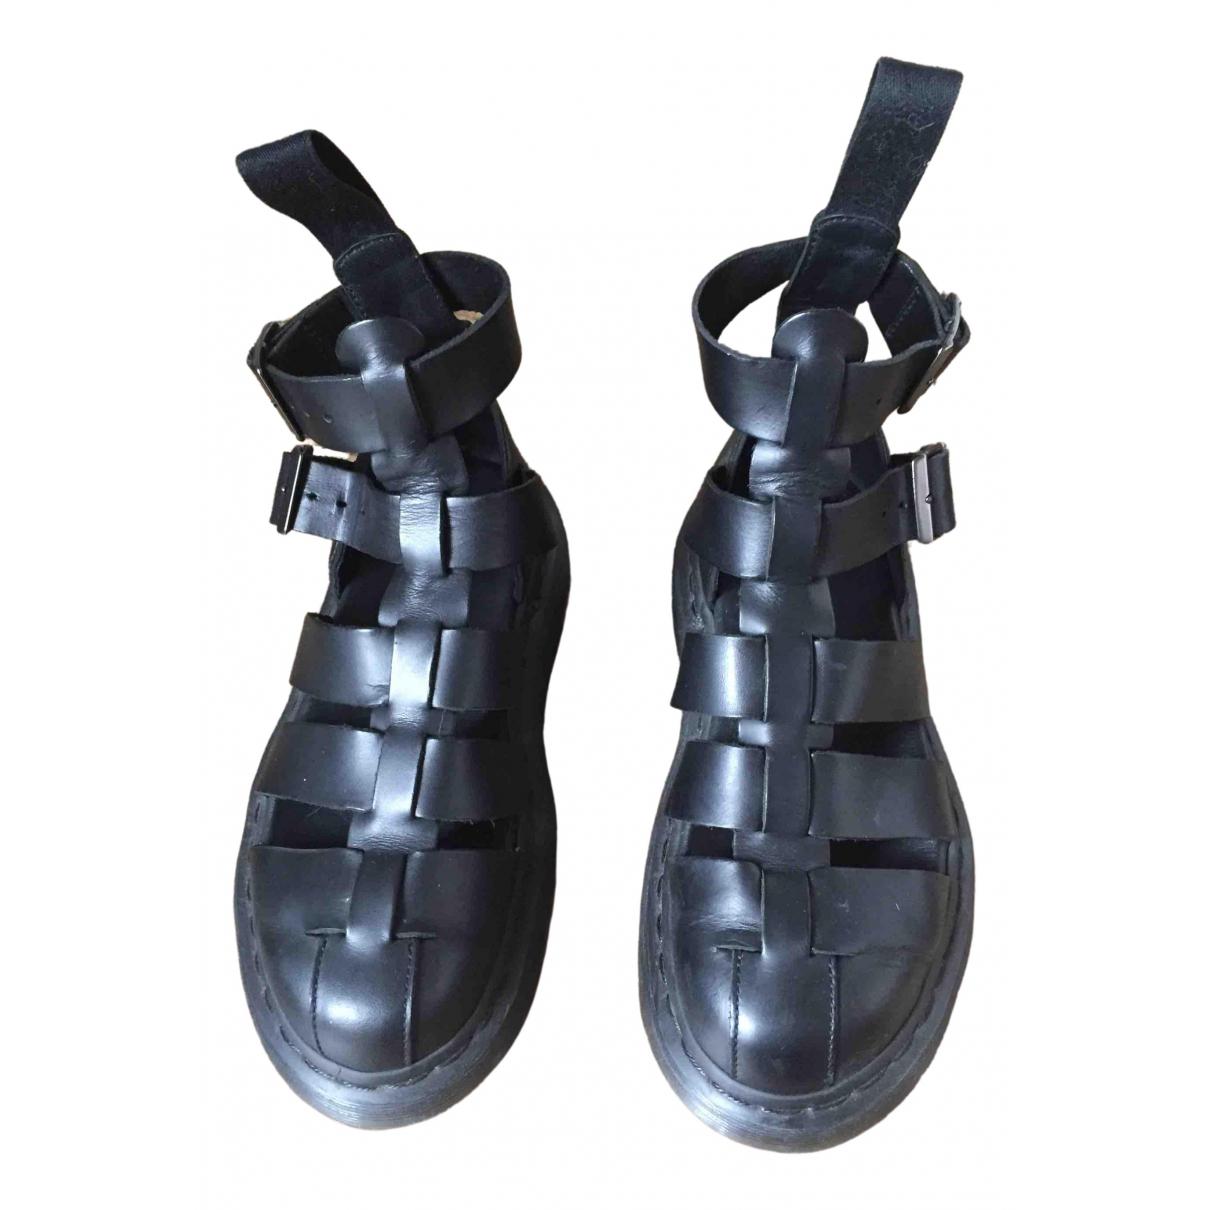 Sandalias romanas de Cuero Dr. Martens